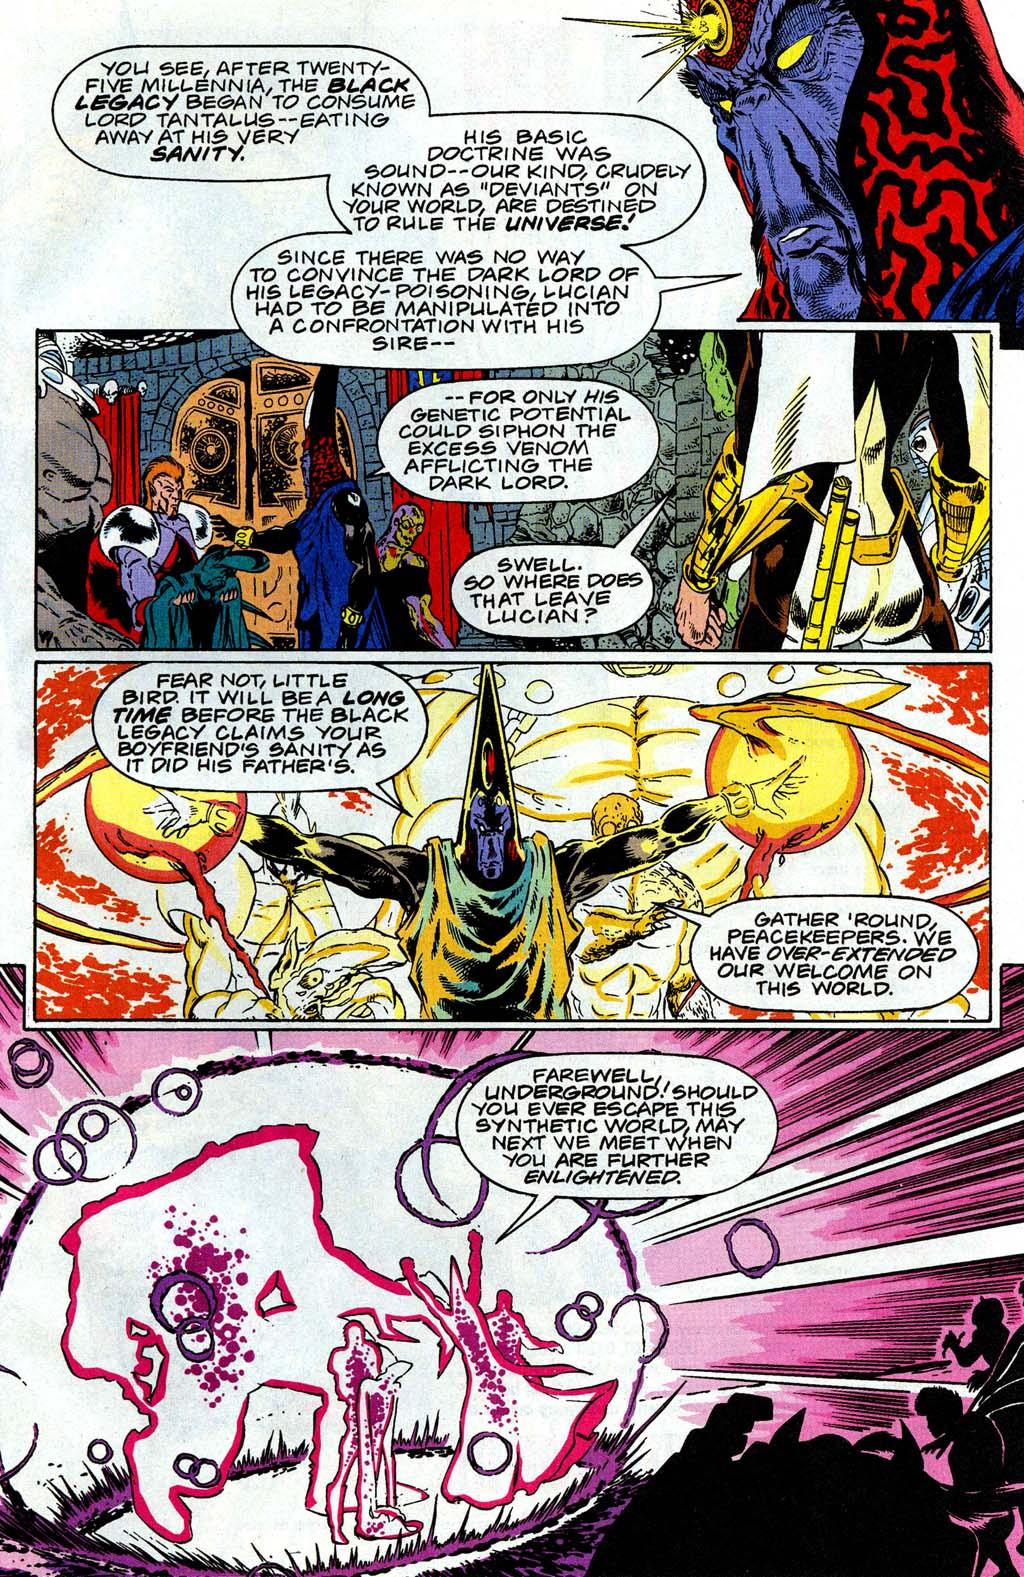 Read online Blackwulf comic -  Issue #10 - 20